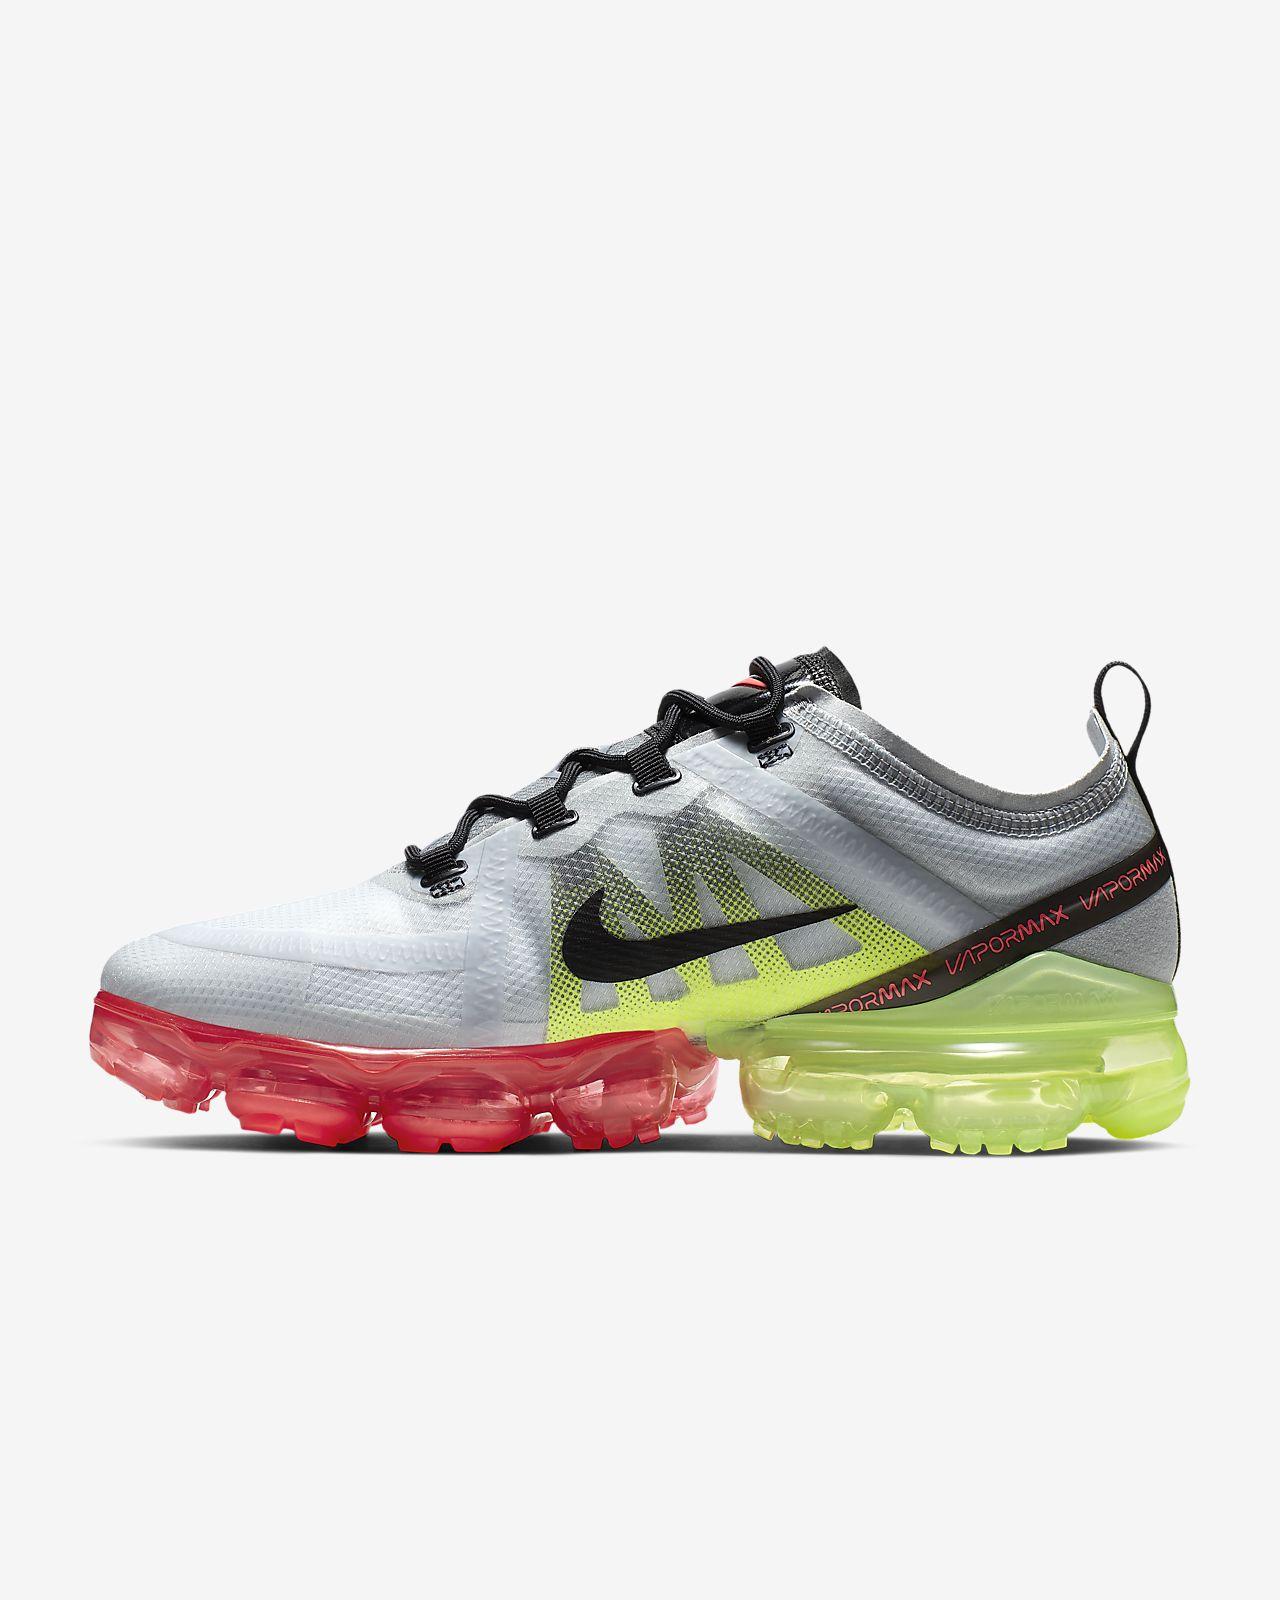 468719e49d4e Chaussure Nike Air VaporMax 2019. Nike.com FR